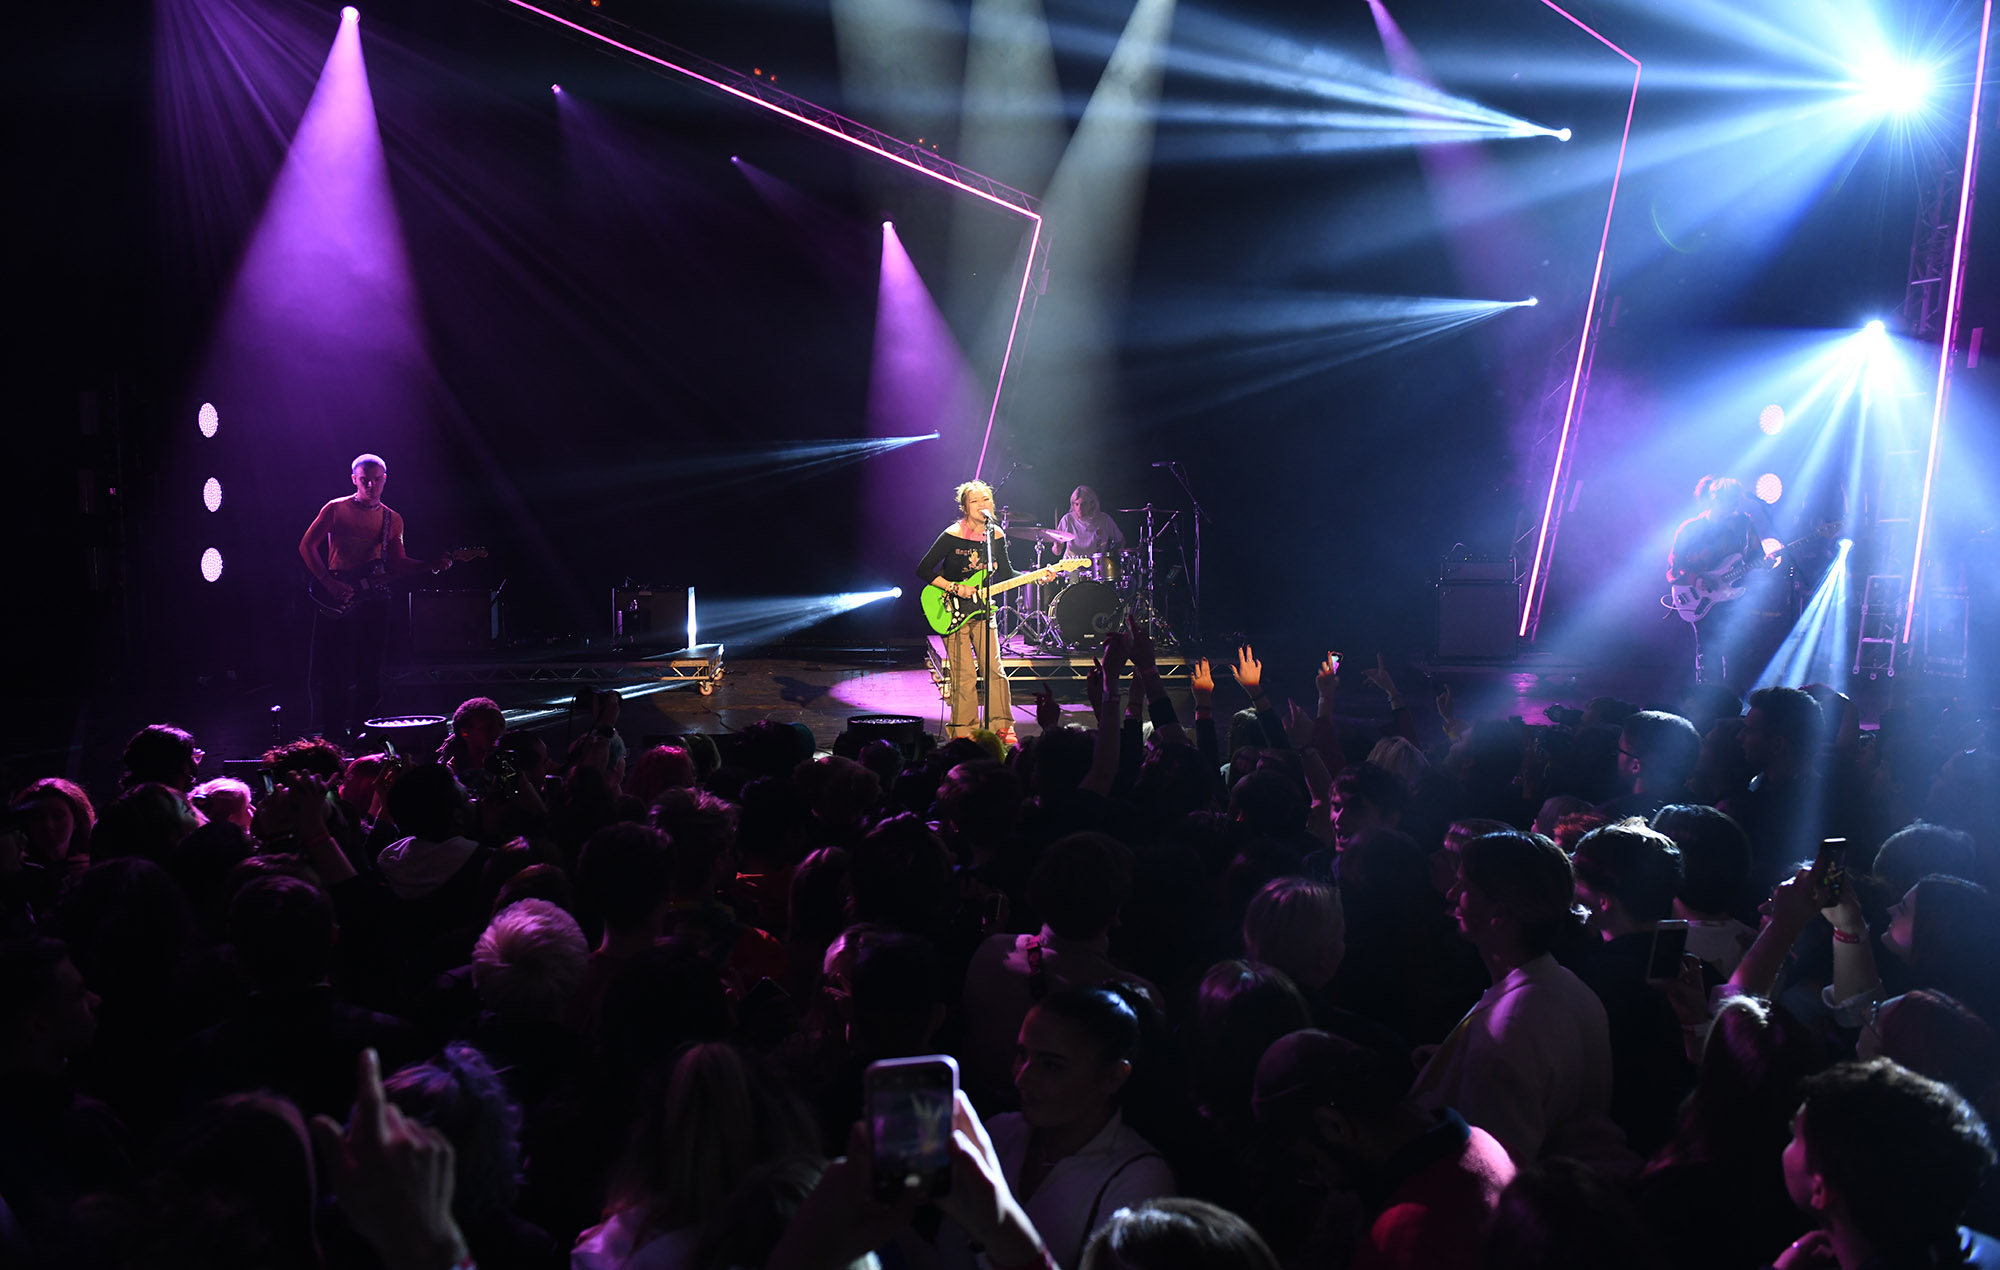 Beabadoobee, NME Awards 2020